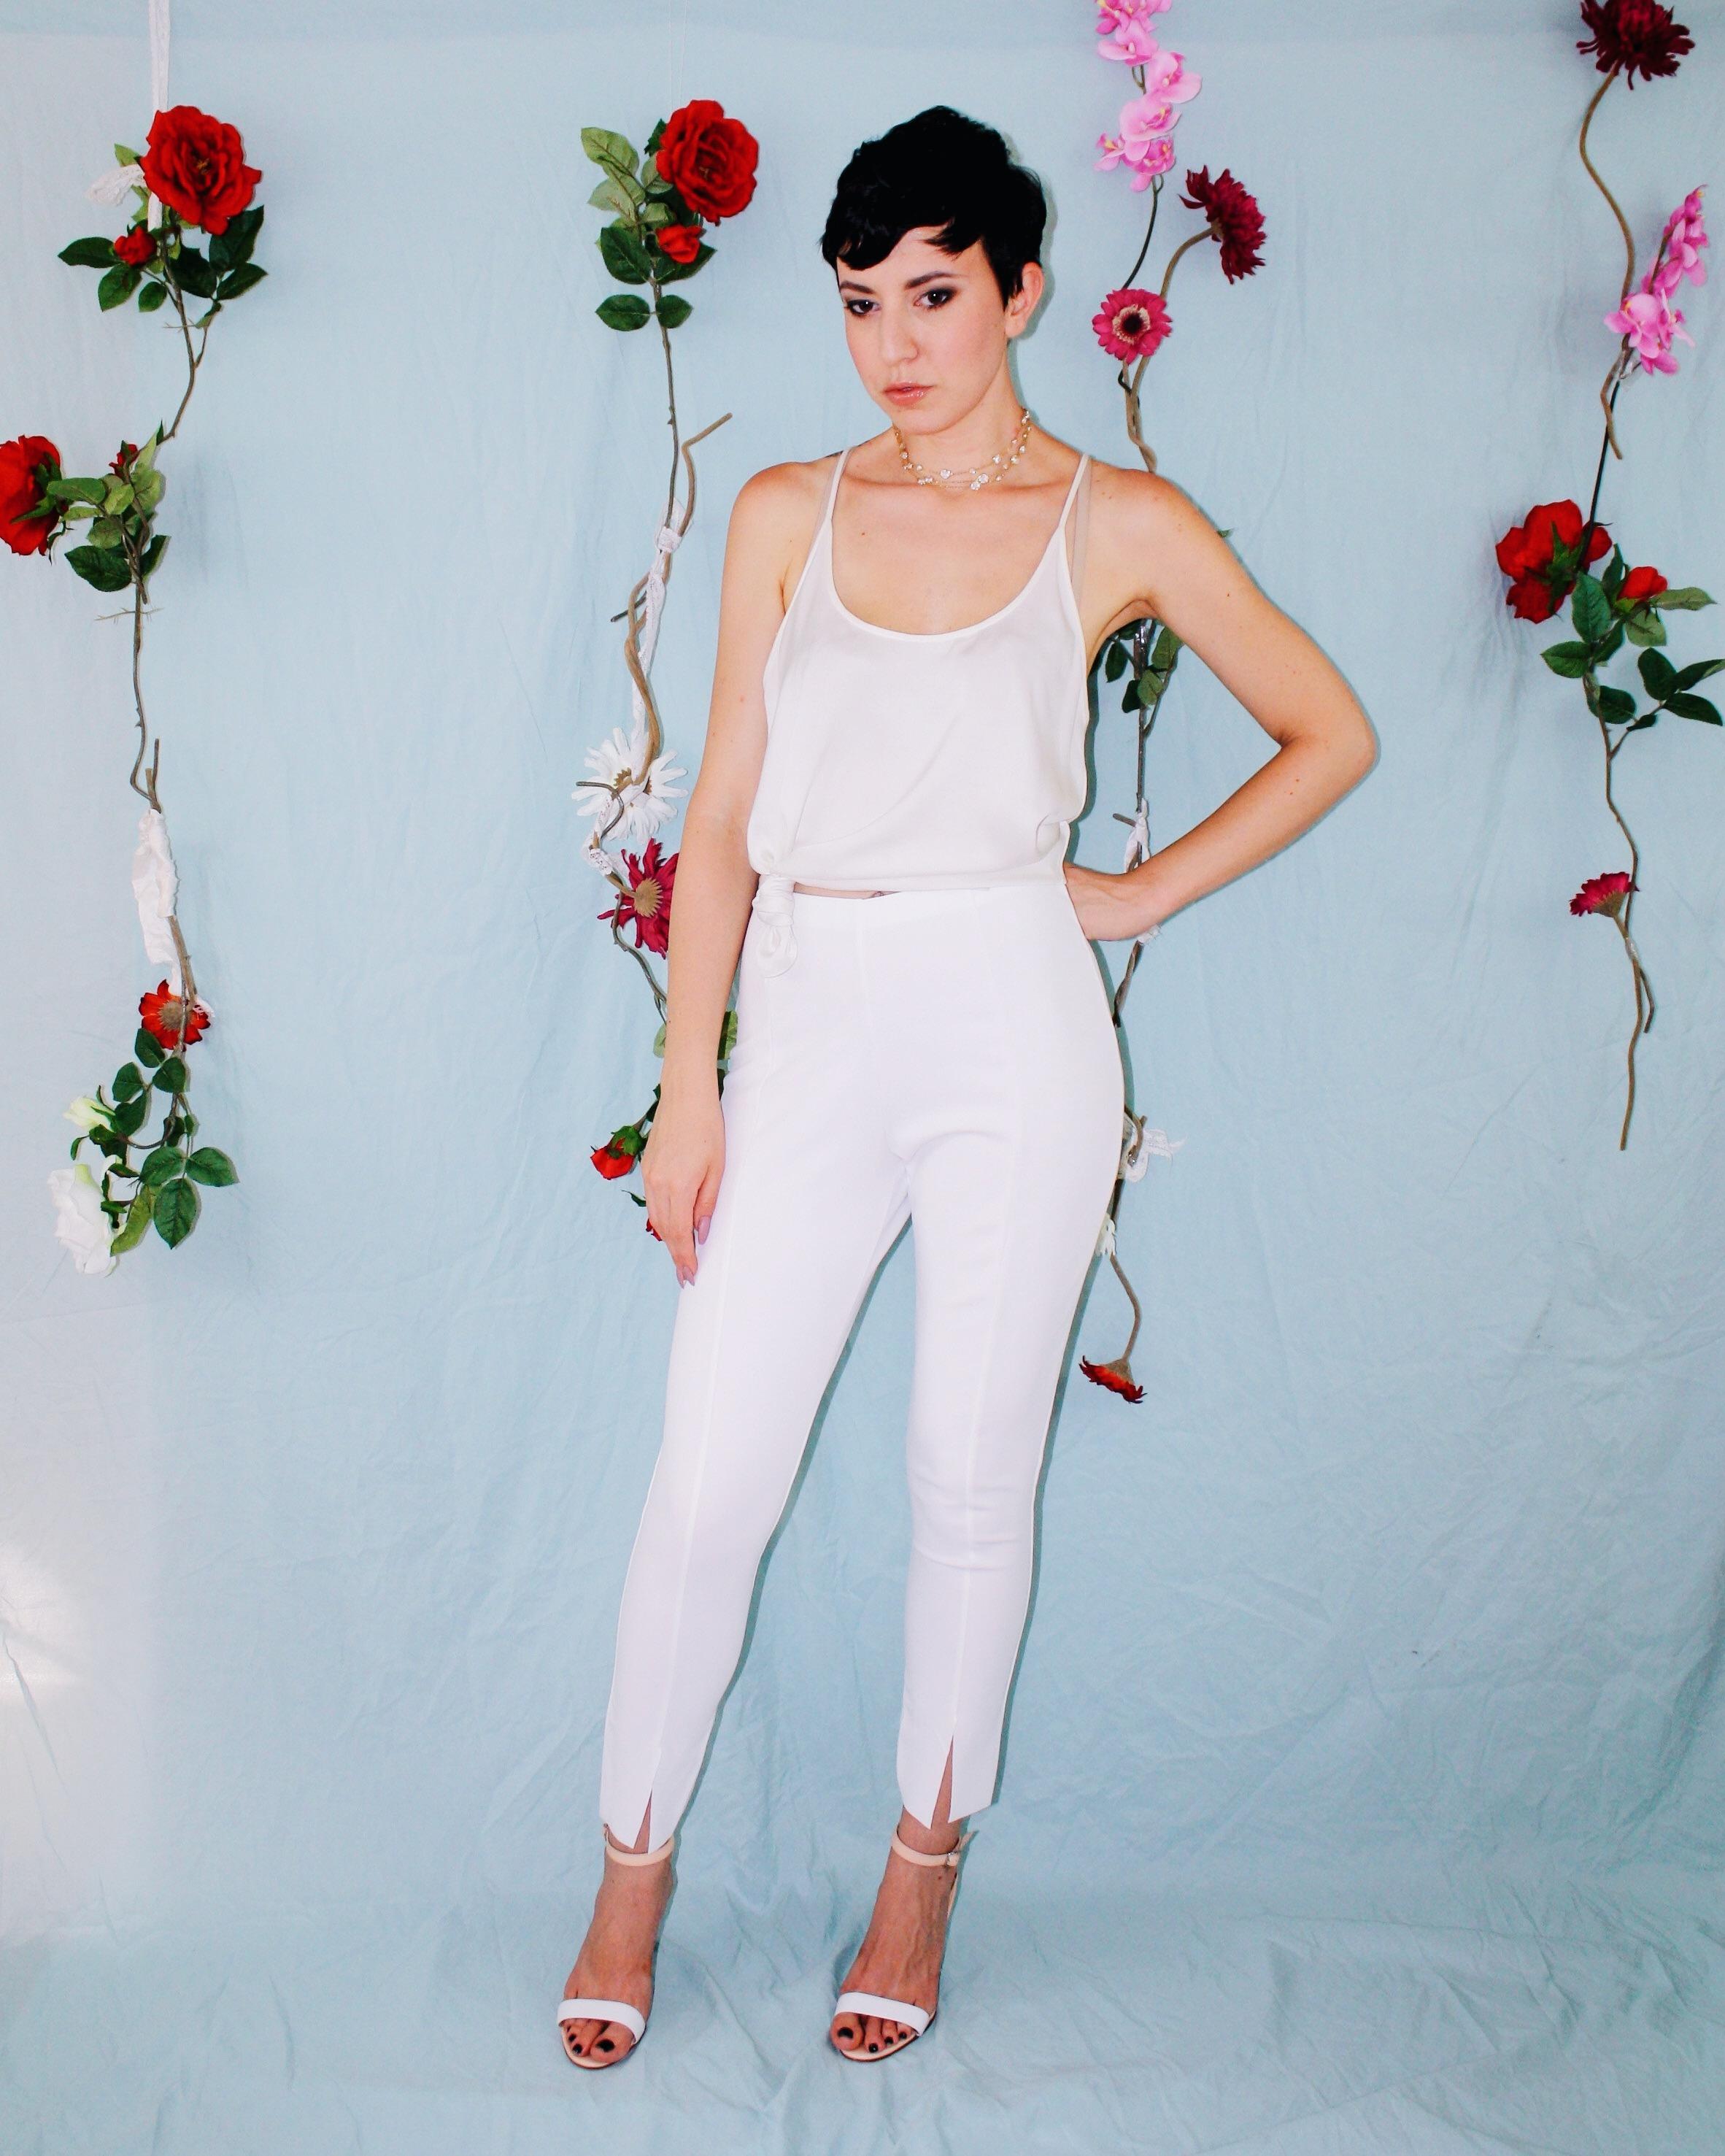 labor day outfit ideas white leggings silk tank lace boustier linen shorts dress 2